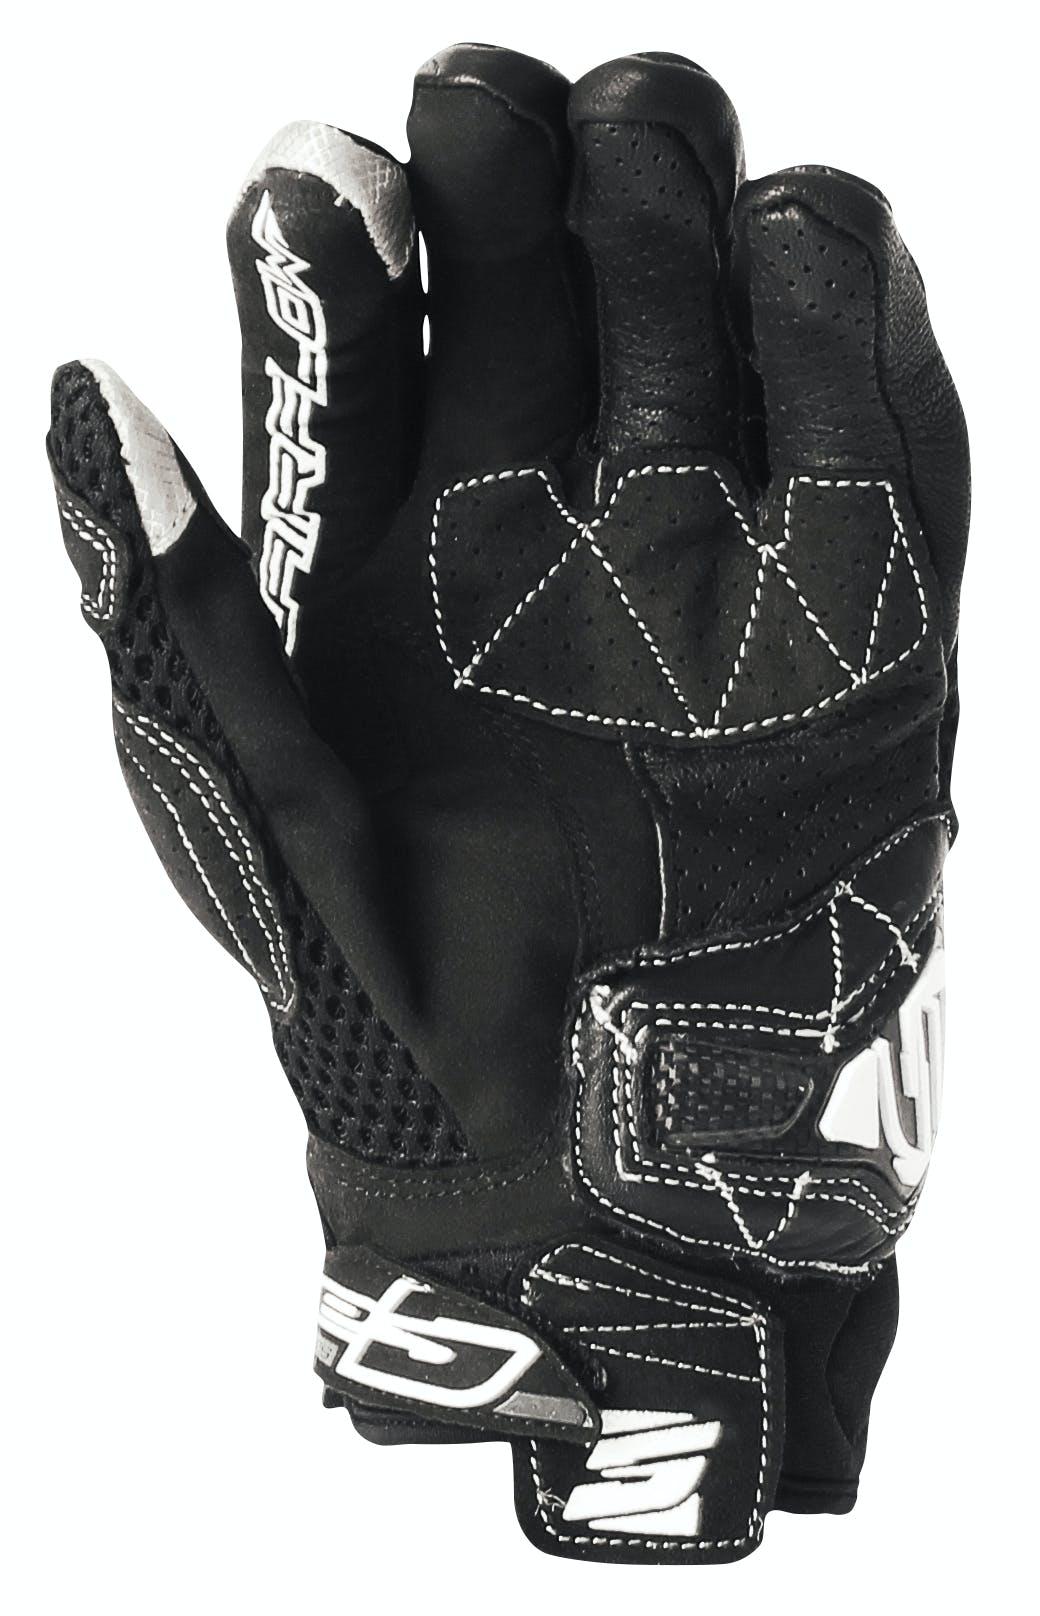 The palm of teh Five Stunt glove